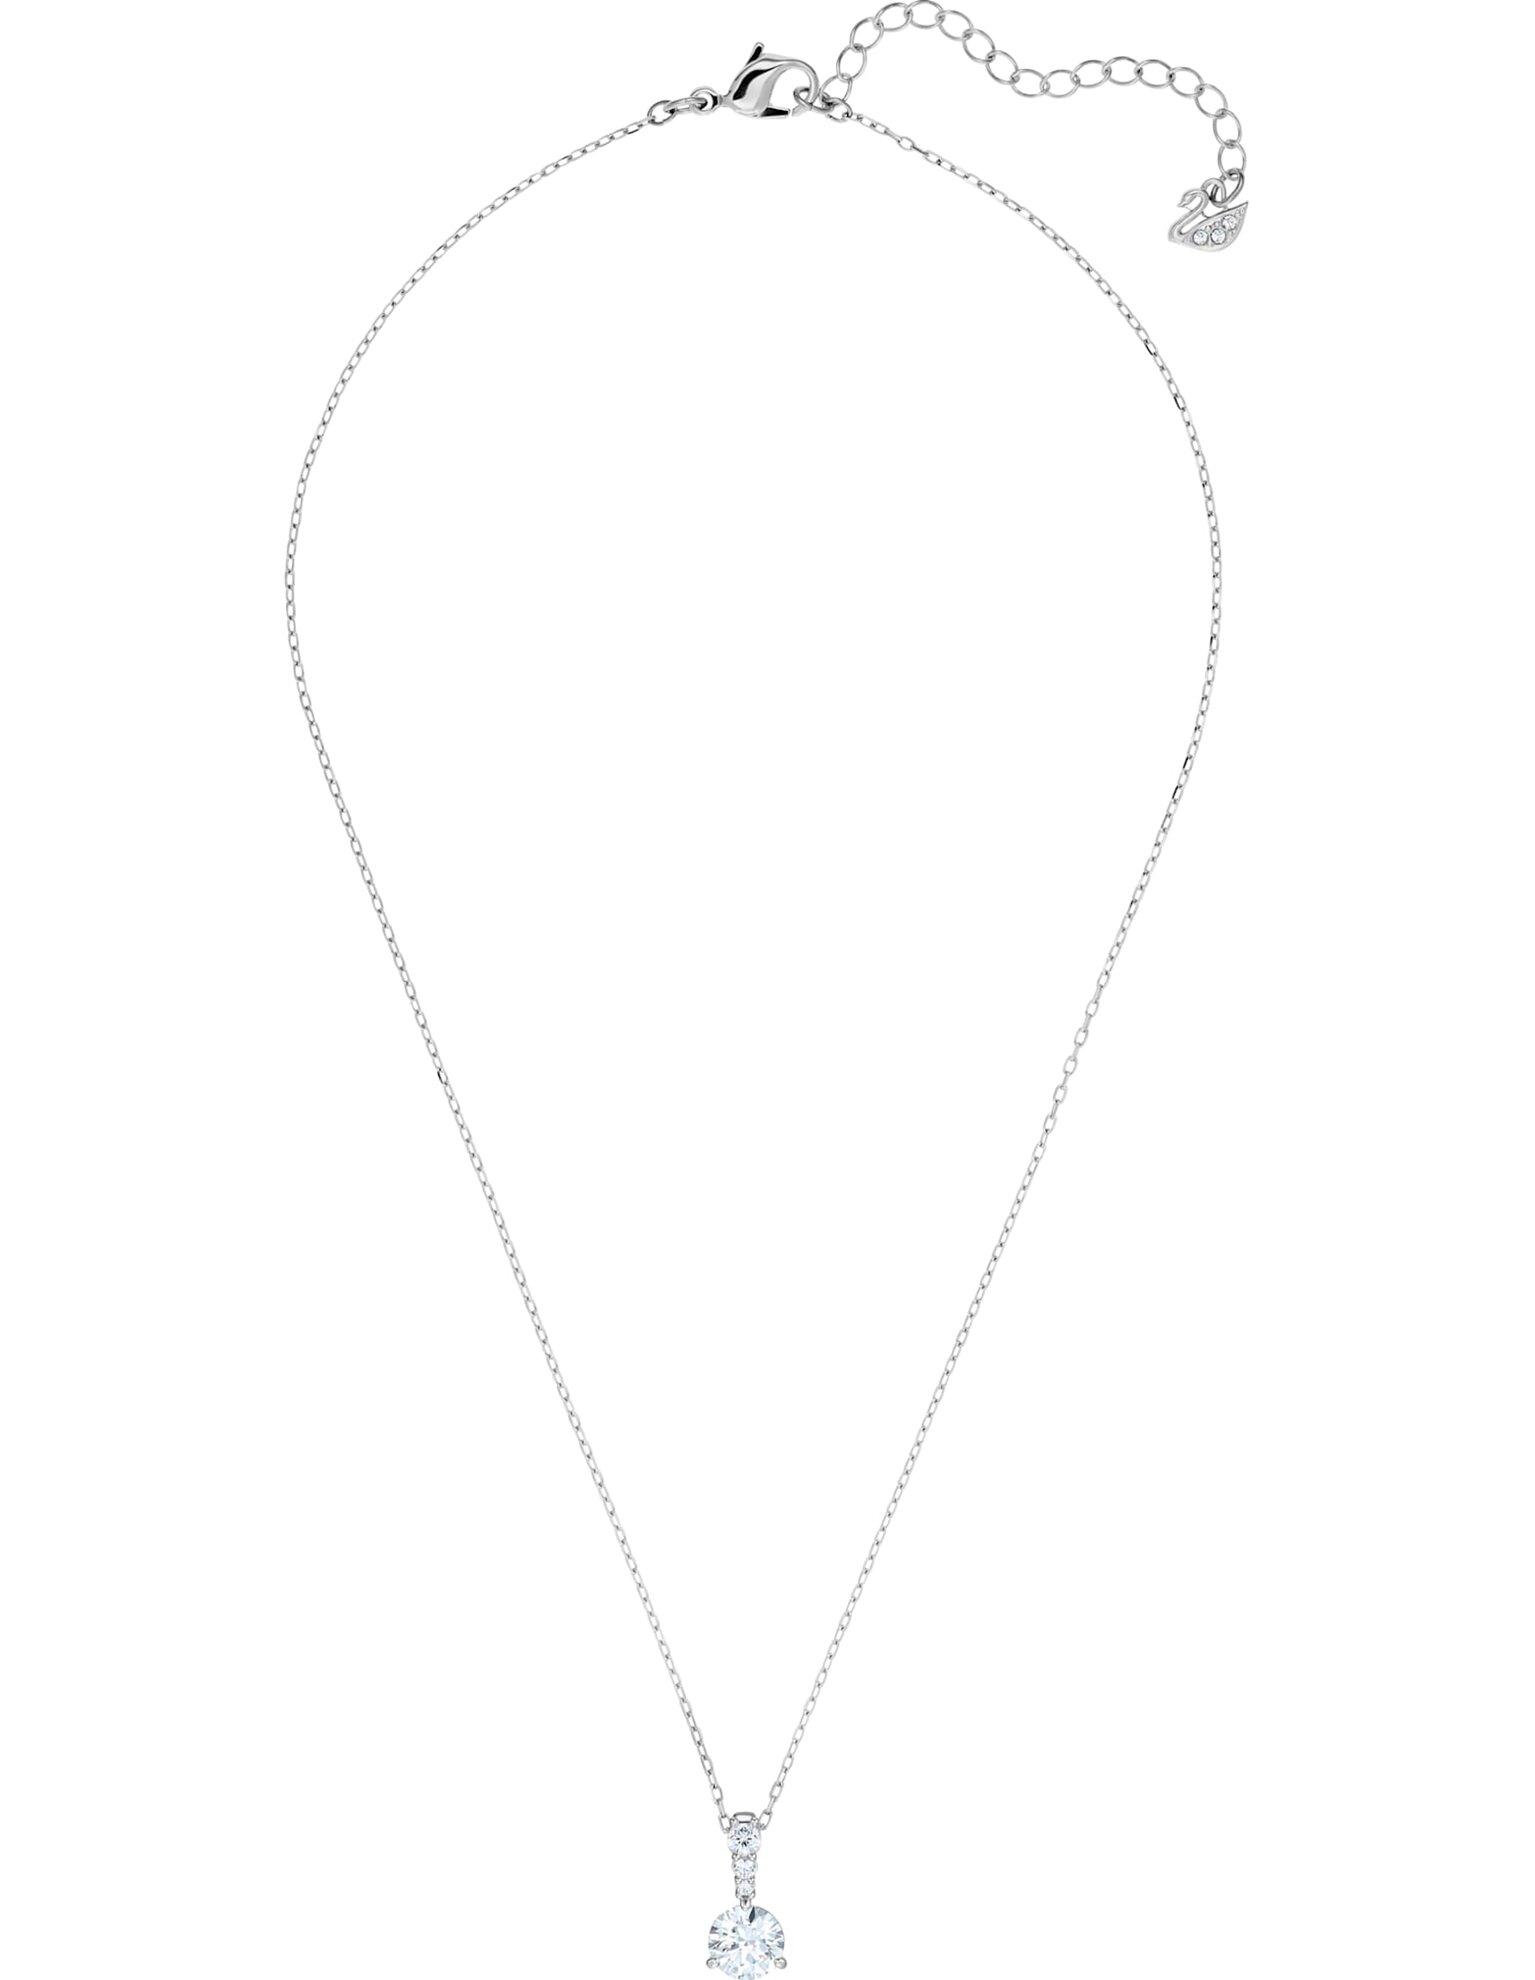 Picture of Solitaire kolye, Beyaz, Rodyum kaplama